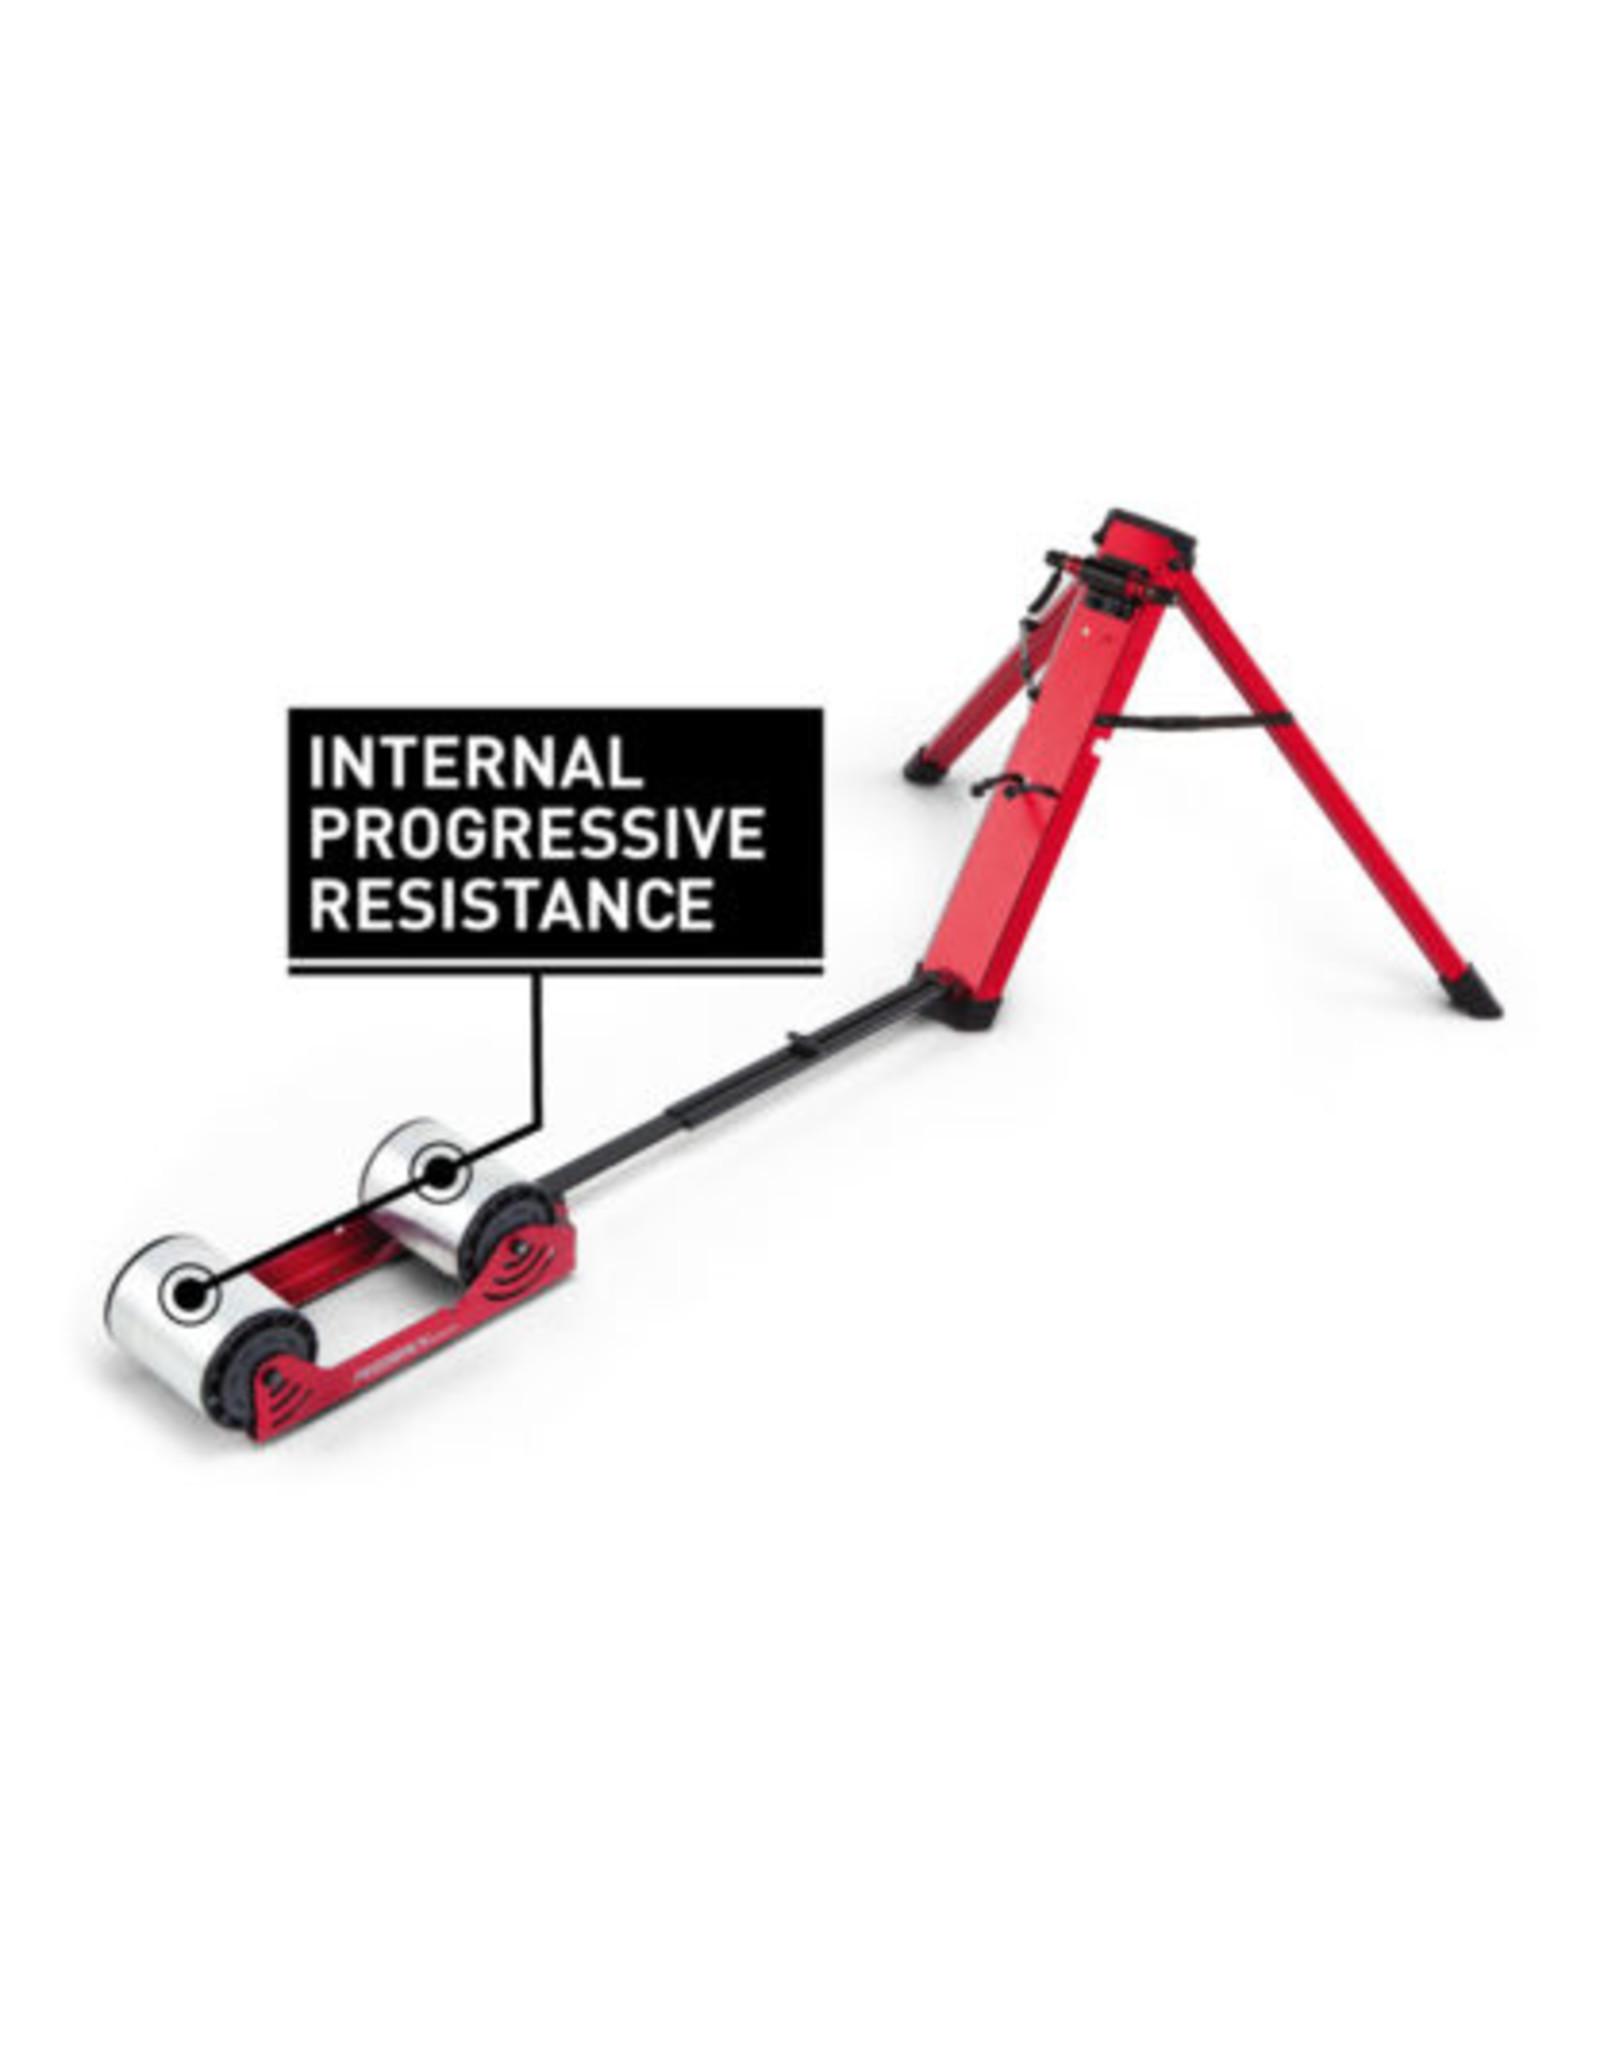 Feedback Sports Feedback Sports Omnium Over-Drive Rear Wheel Trainer - Fork Mount, Progressive Resistance, Red